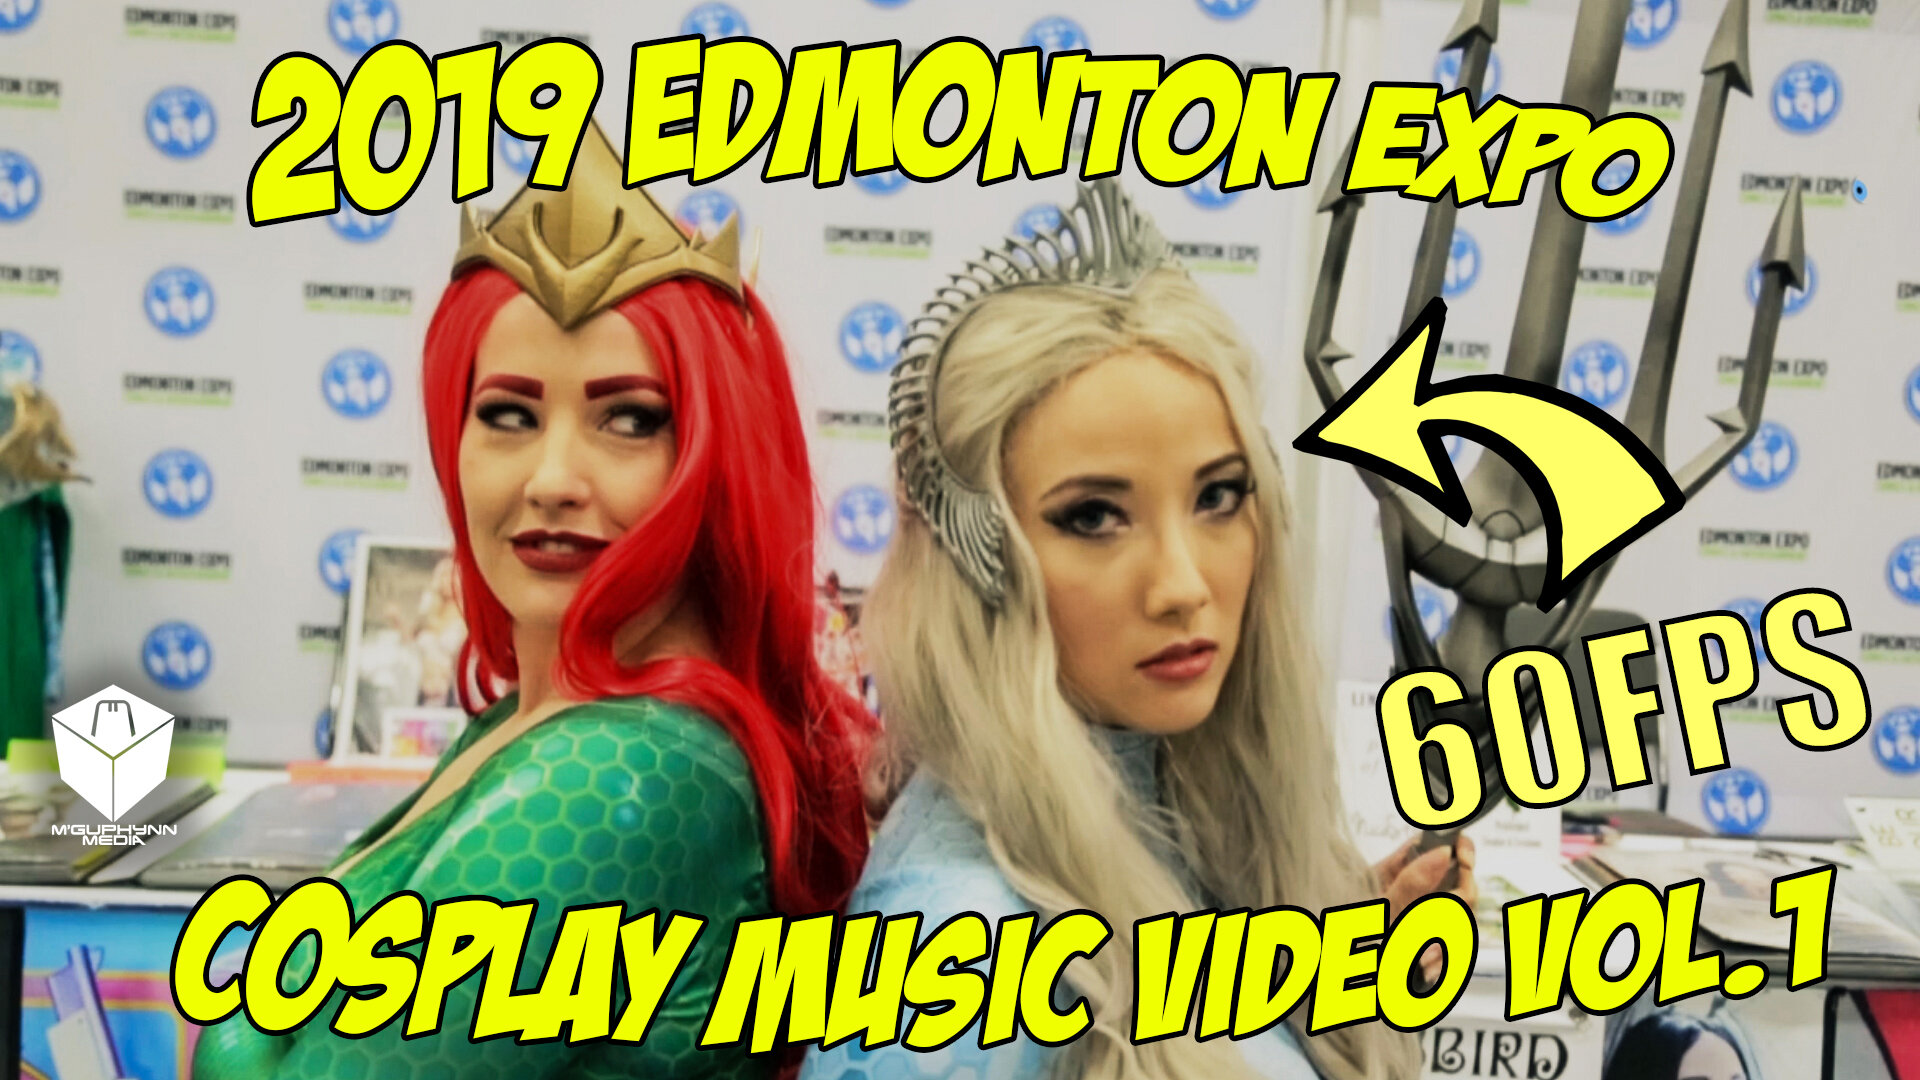 2019 Edmonton Expo Cosplay Music video